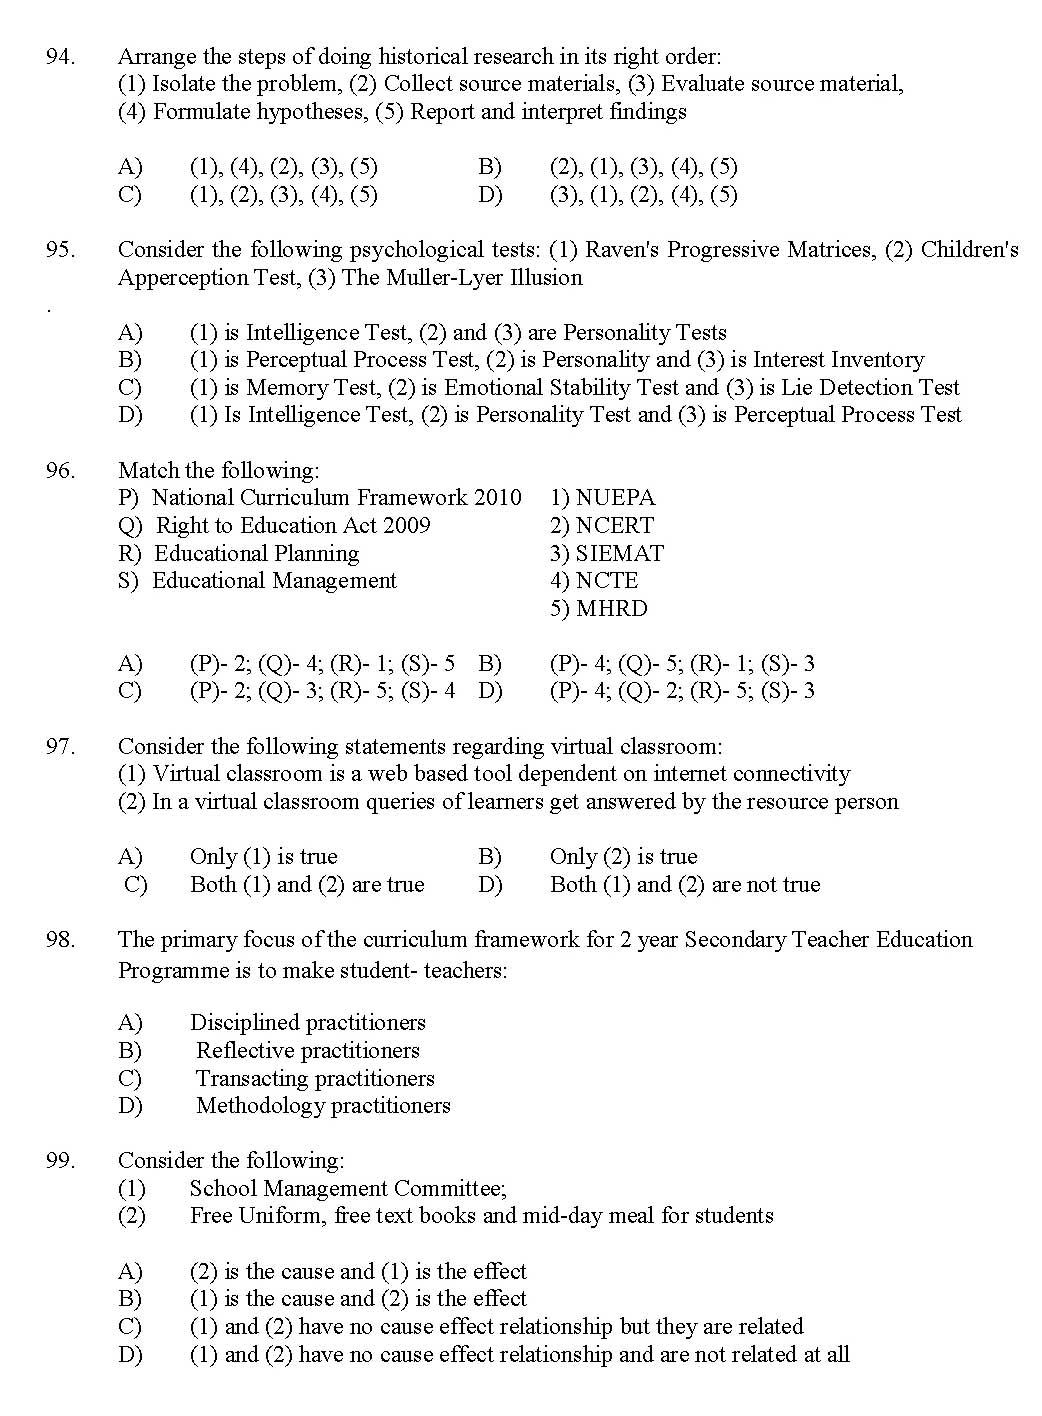 Kerala SET General Knowledge Exam 2017 Question Code 17236 A